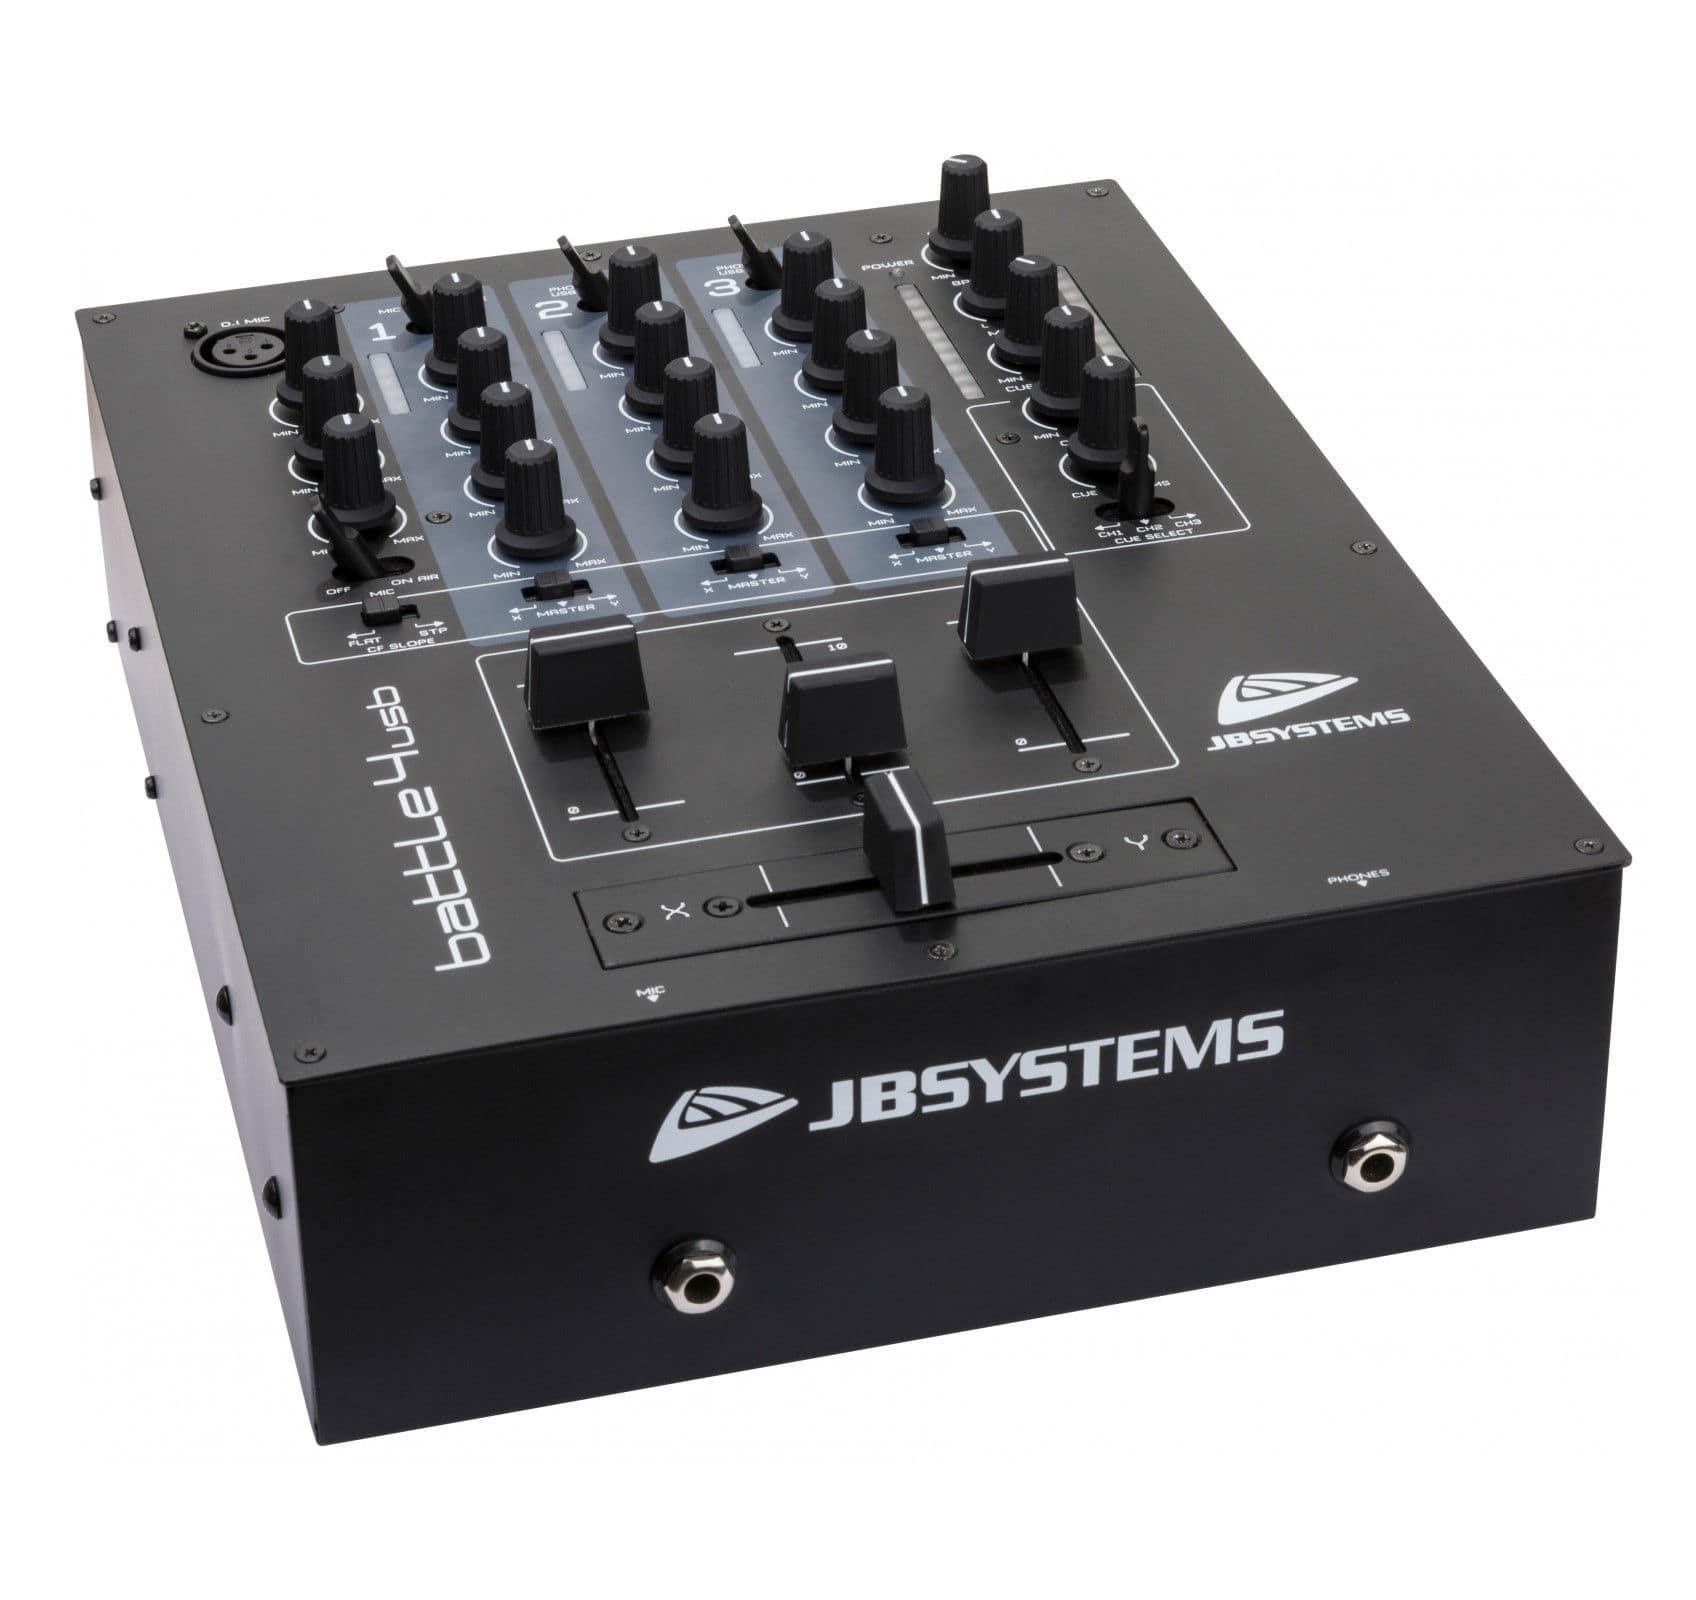 Djmixer - JB Systems Battle 4 USB - Onlineshop Musikhaus Kirstein